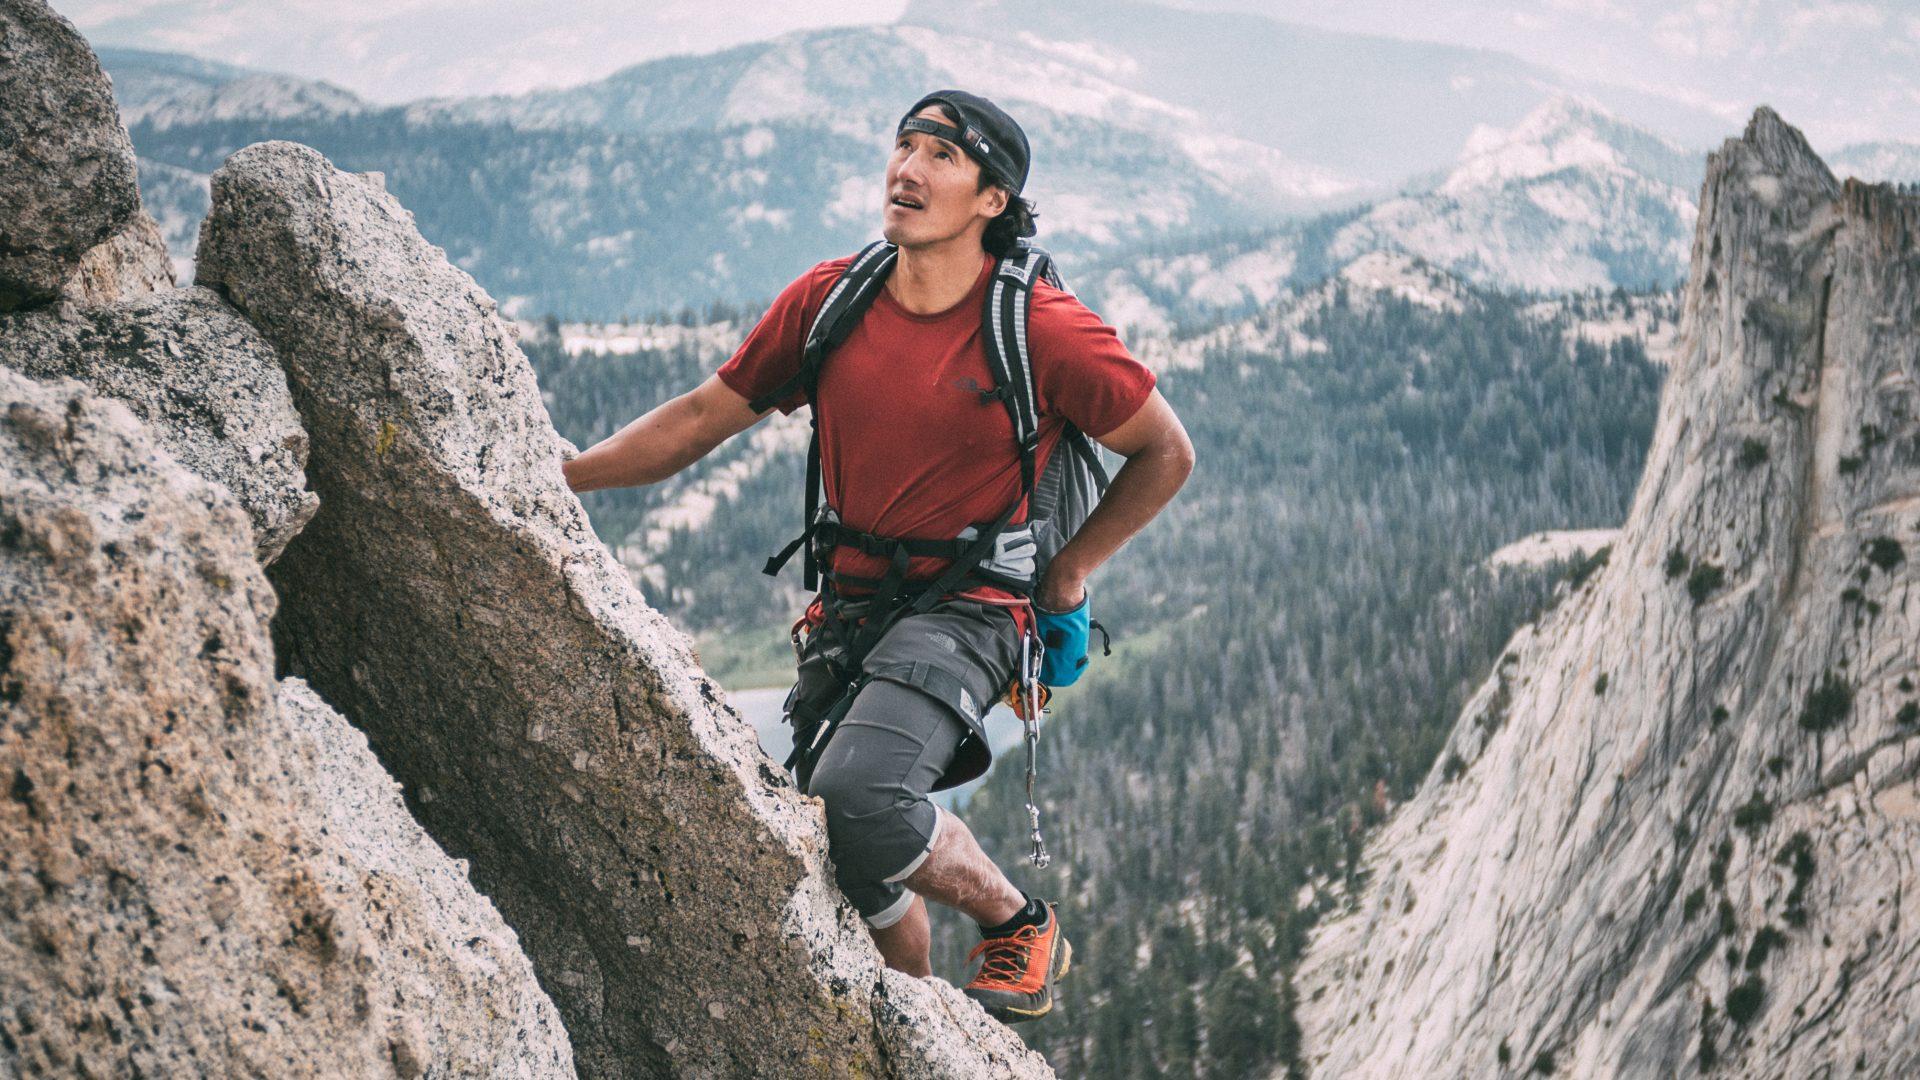 Arcade Belts hiking climbing products adventure belt